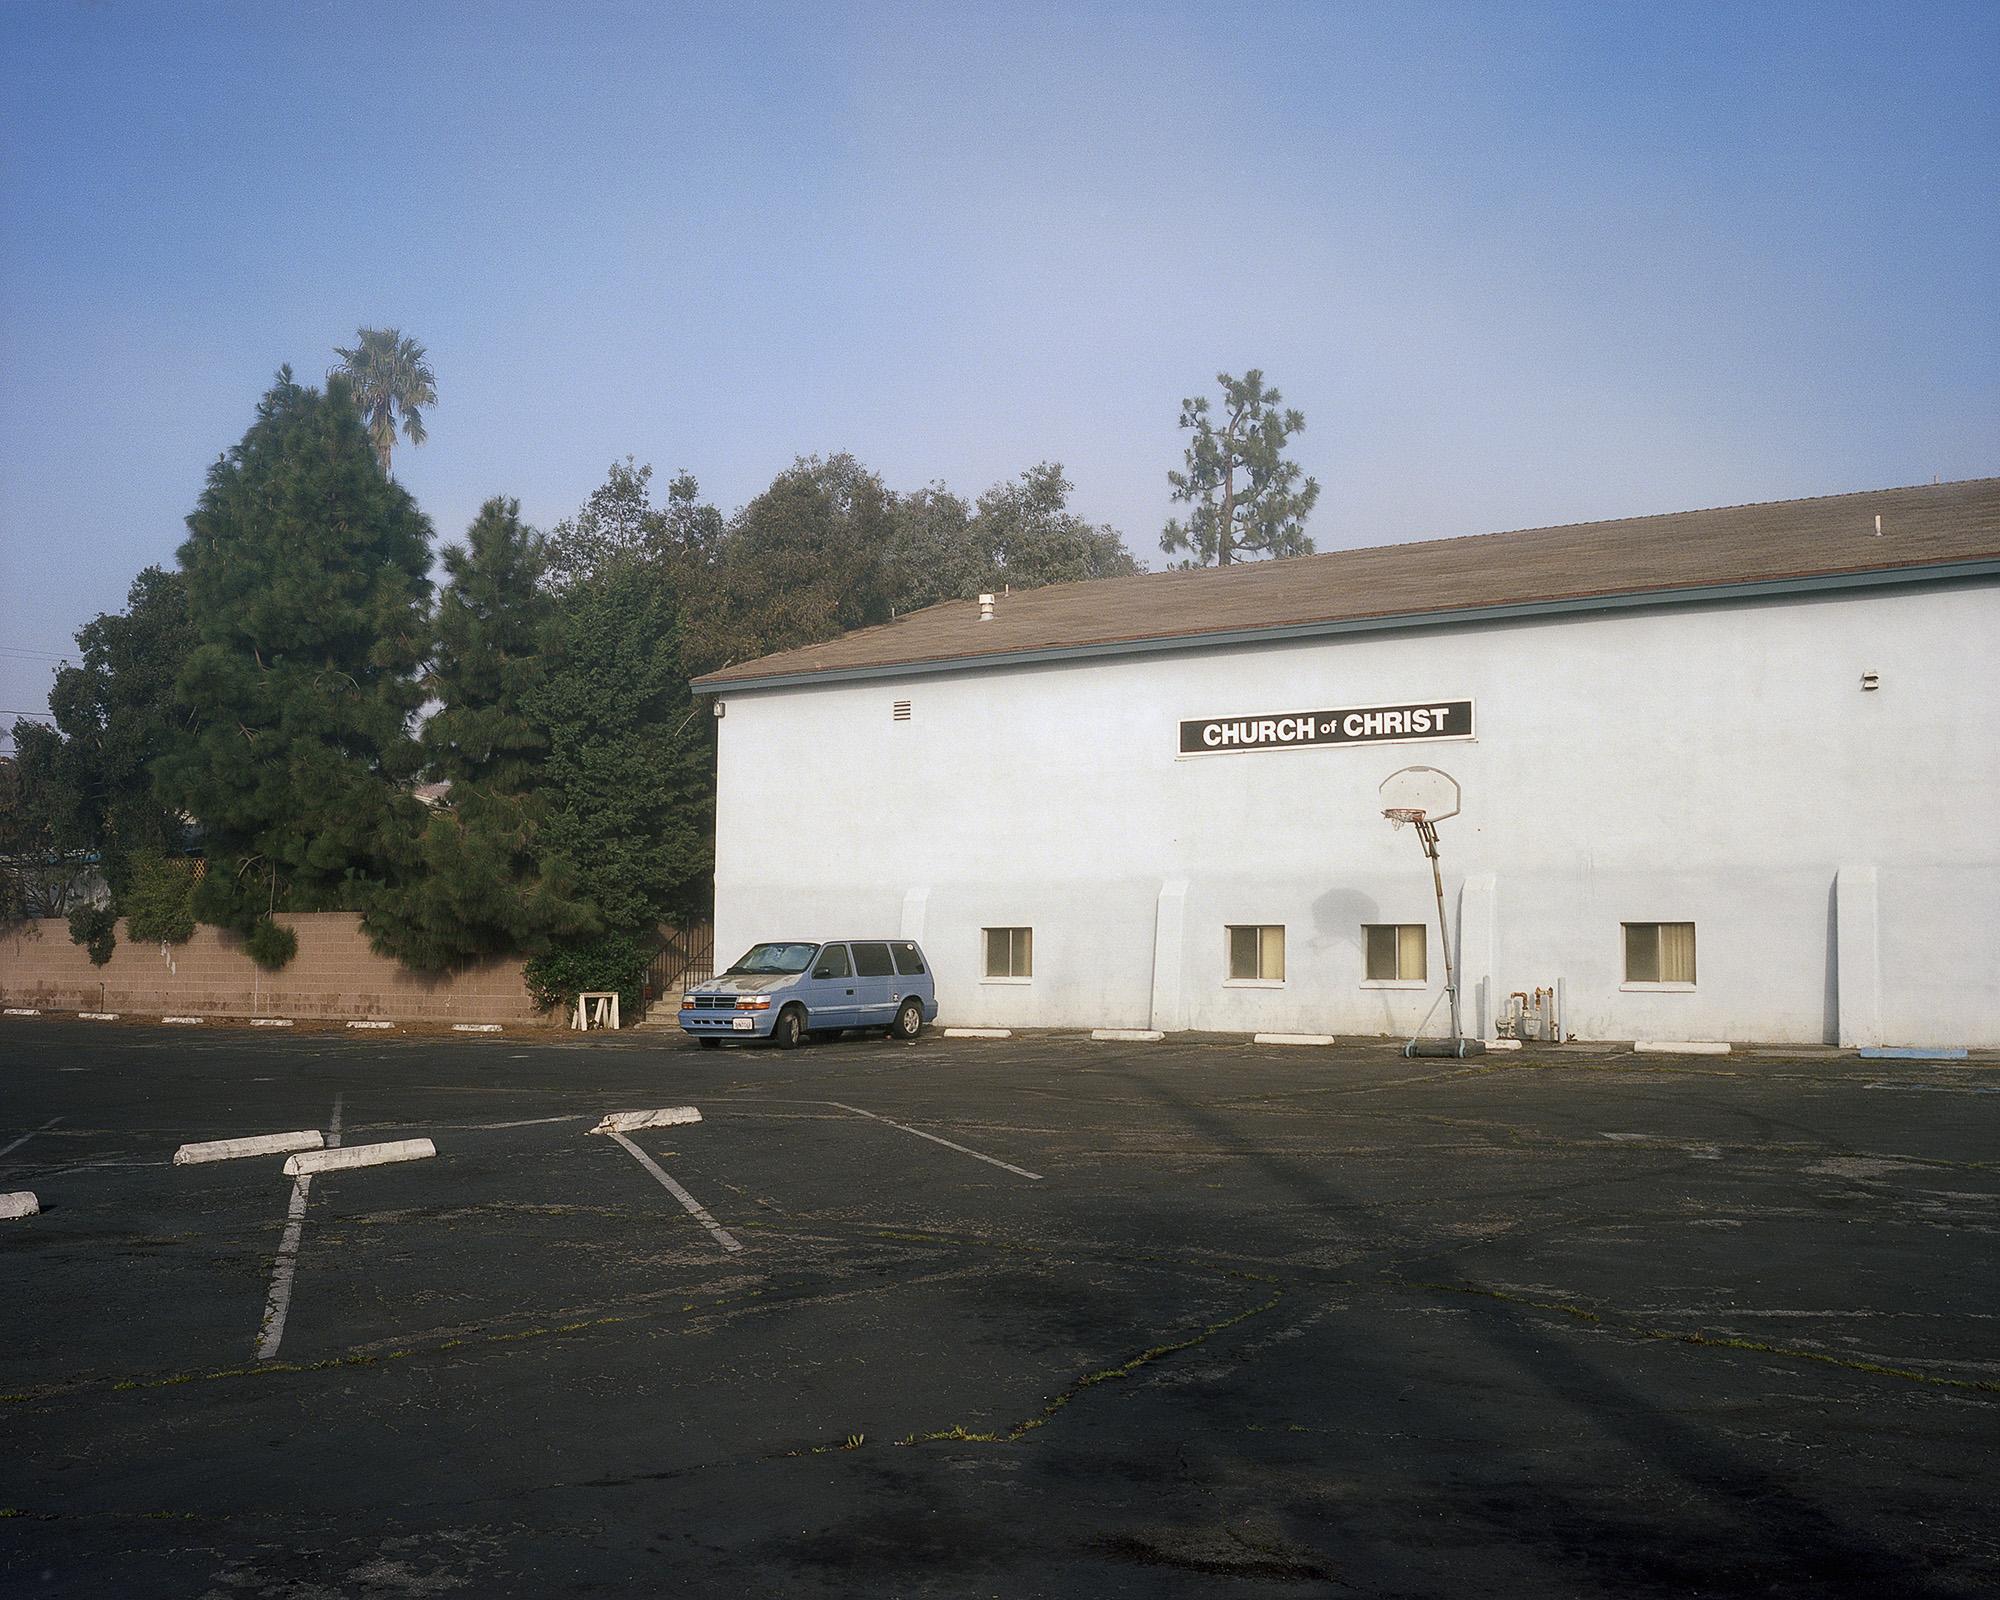 Church Of Christ.jpg